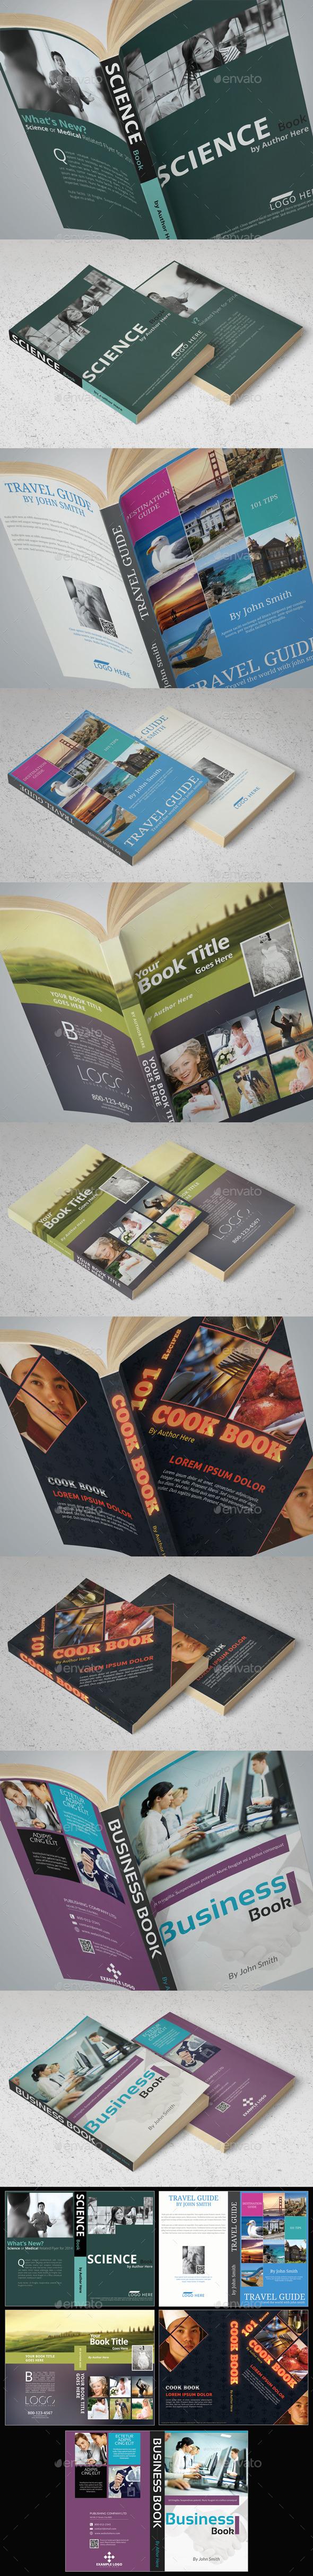 5x Book Cover Templates Bundle - Miscellaneous Print Templates